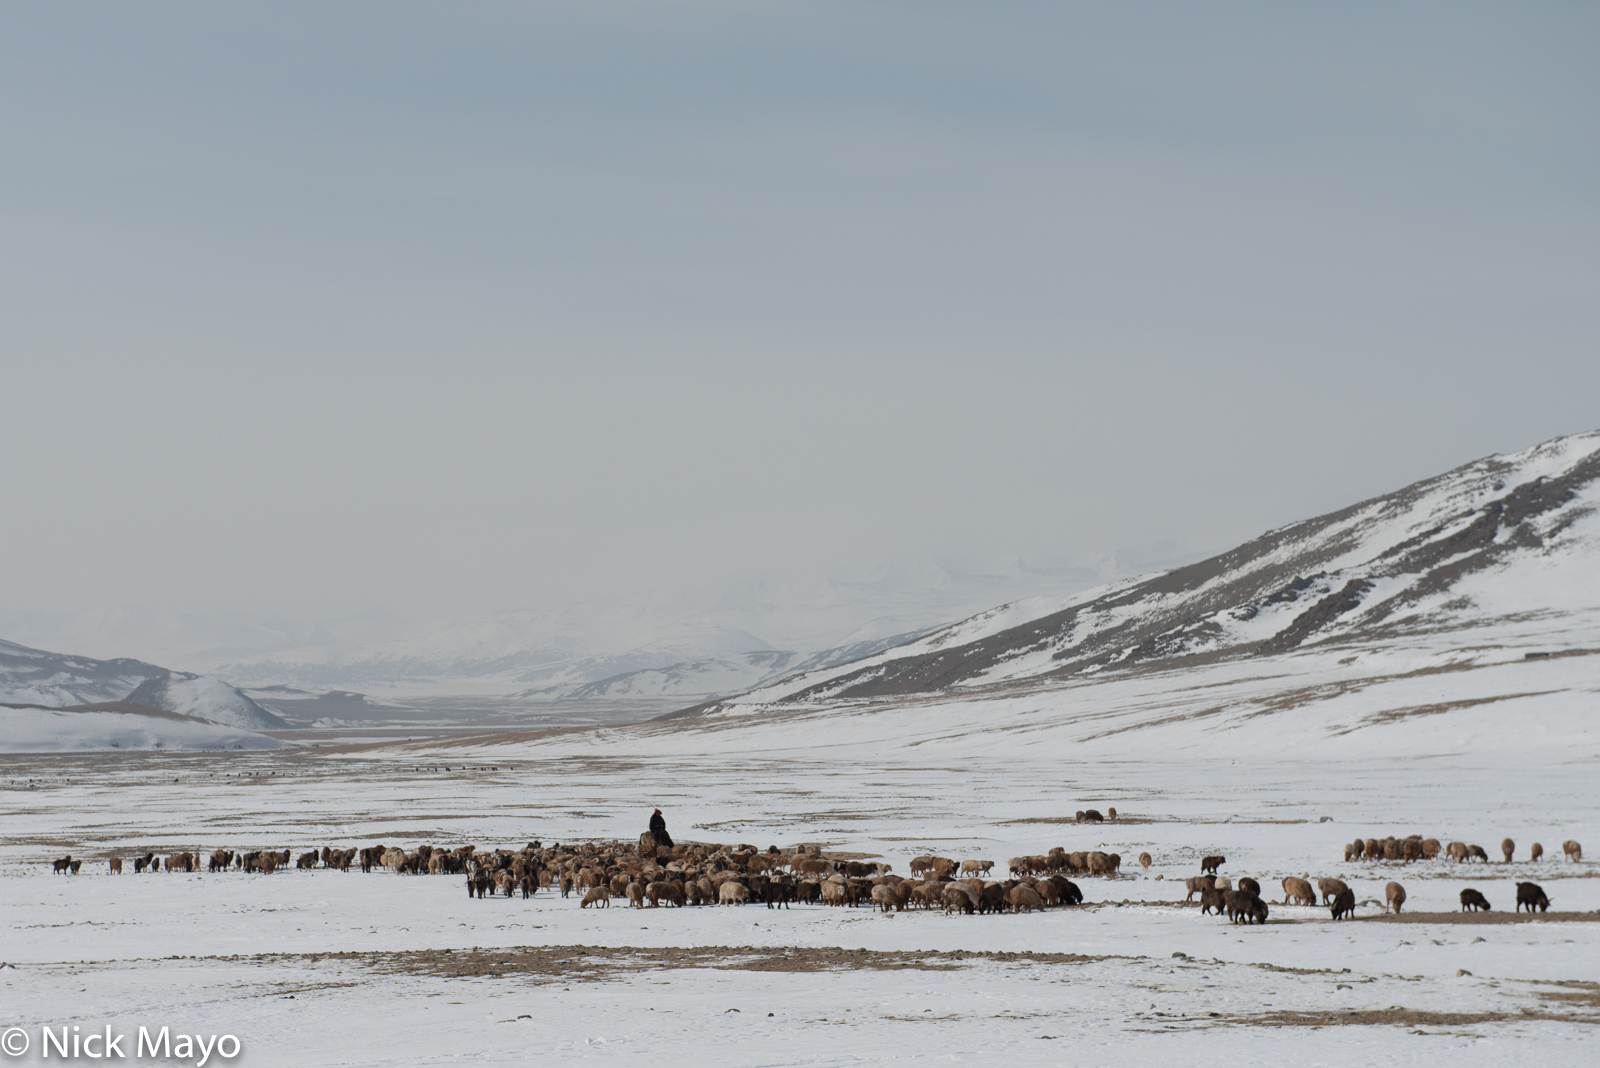 Bayan-Ölgii, Goat, Horse, Kazakh, Mongolia, Sheep, photo